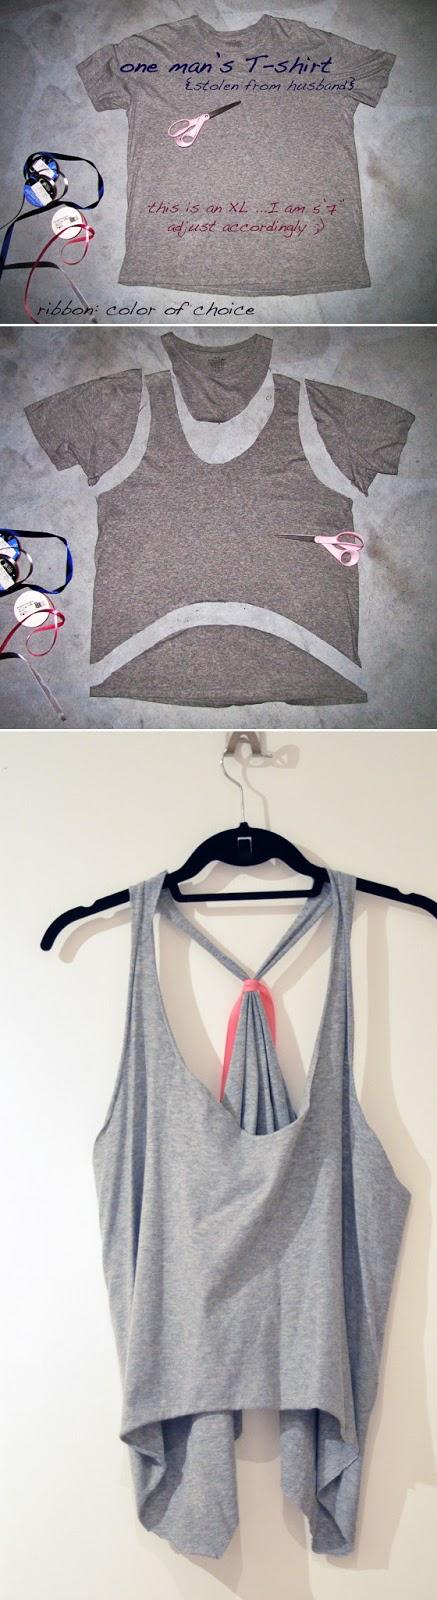 Tie Back Tank Top